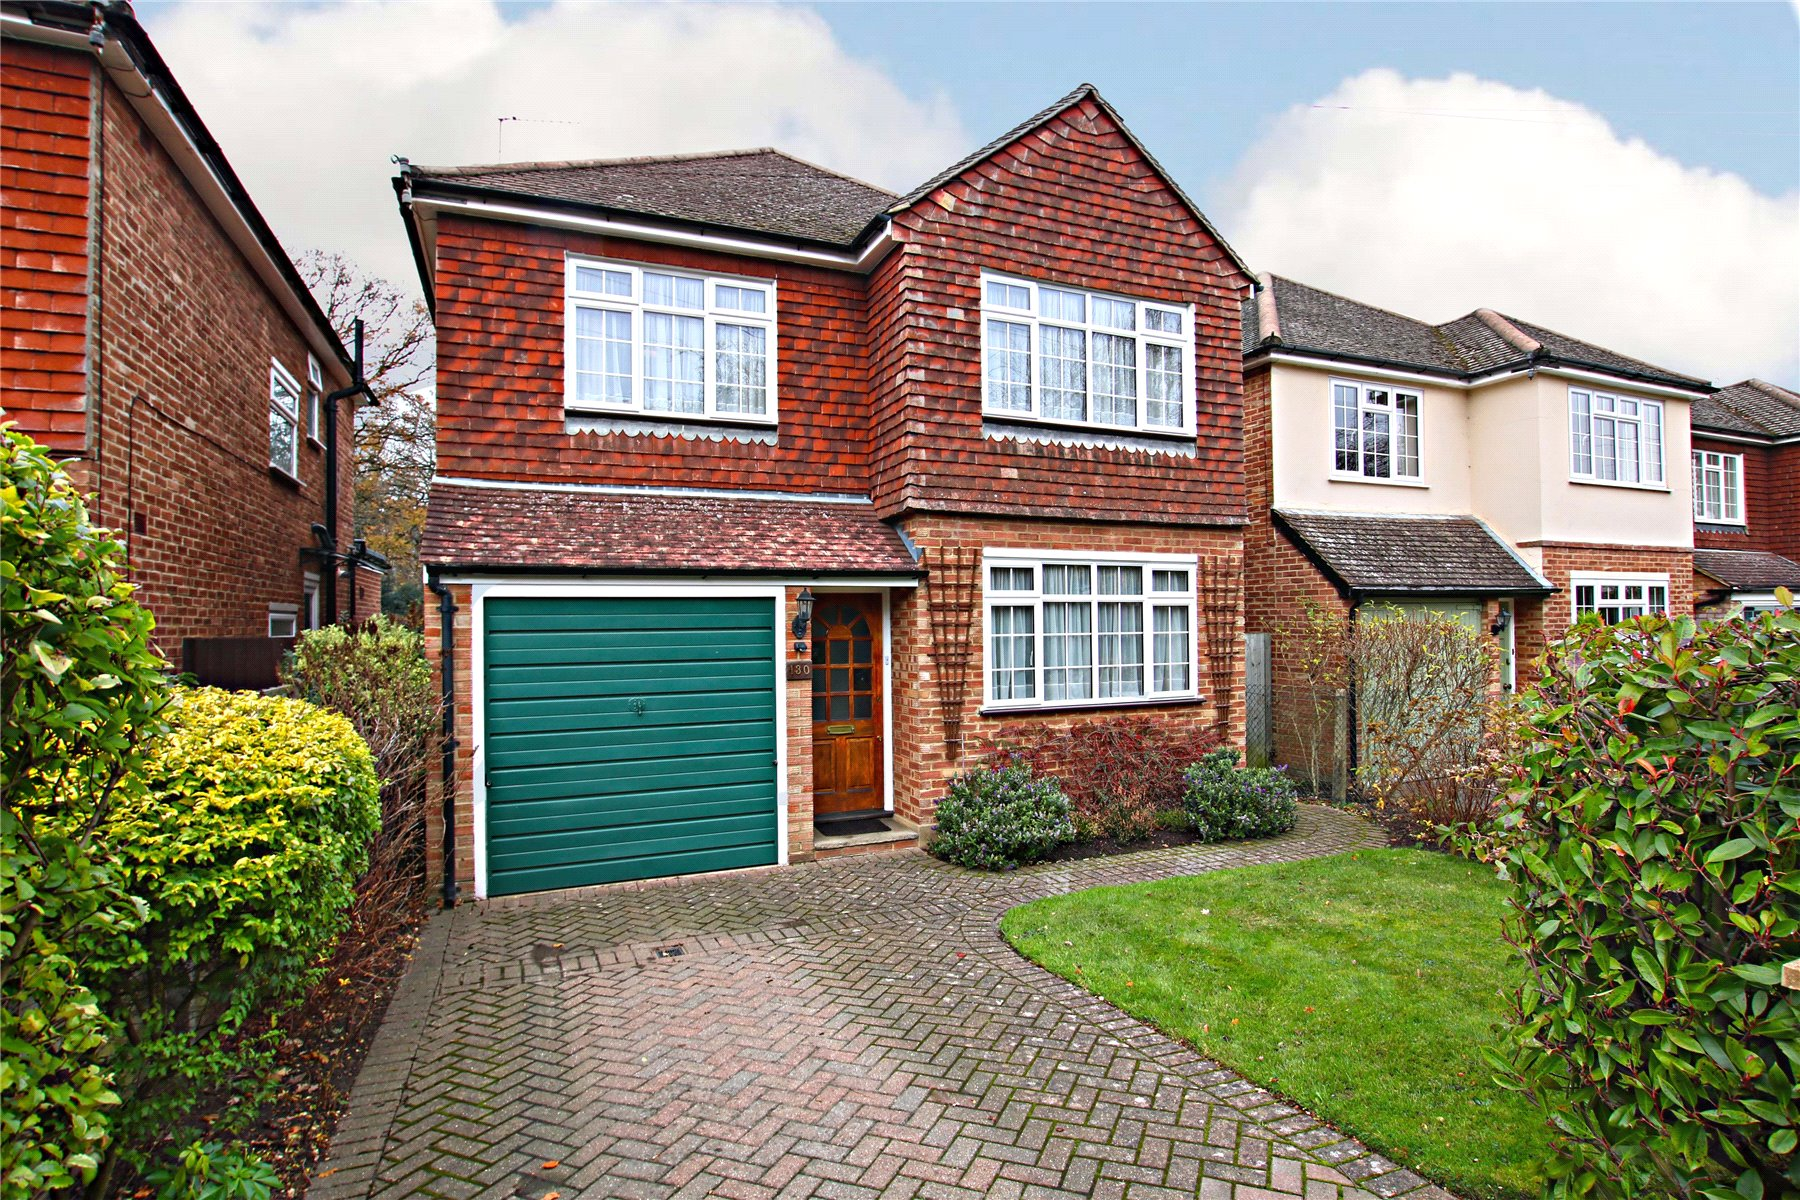 3 Bedrooms Detached House for sale in Woodlands Avenue, West Byfleet, Surrey, KT14